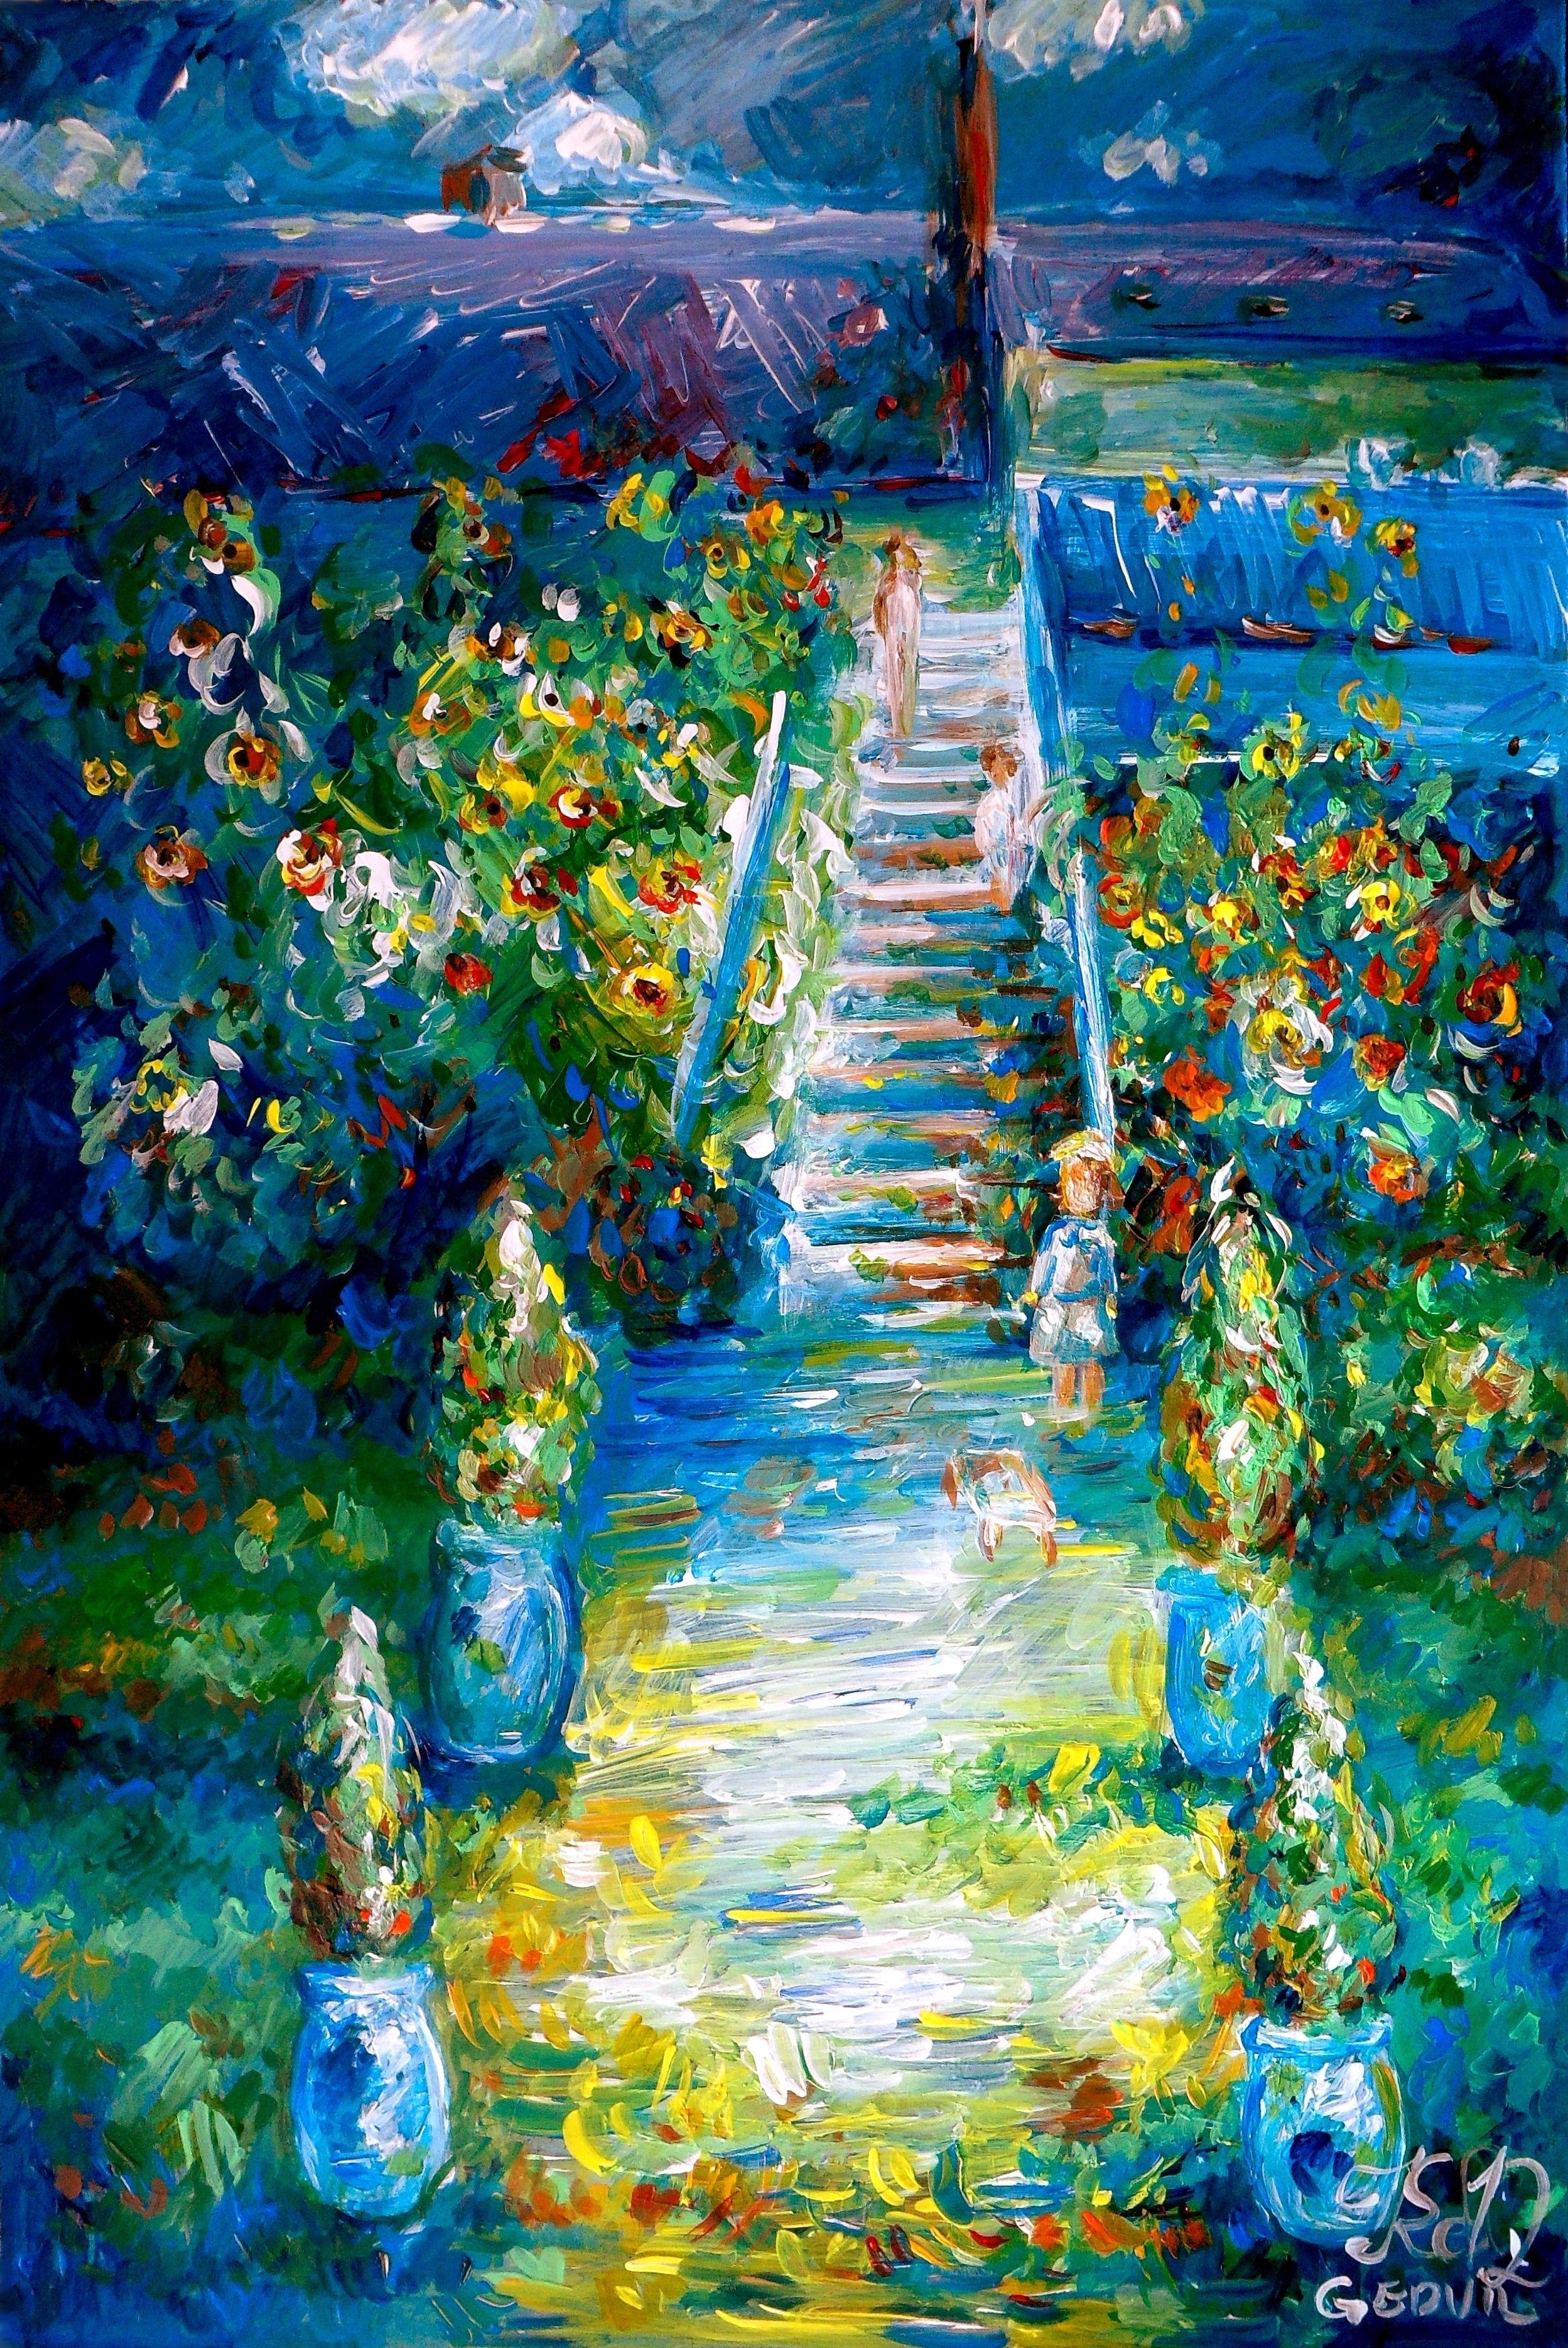 My version of claude monet 39 s painting the artist 39 s garden for Claude monet artwork